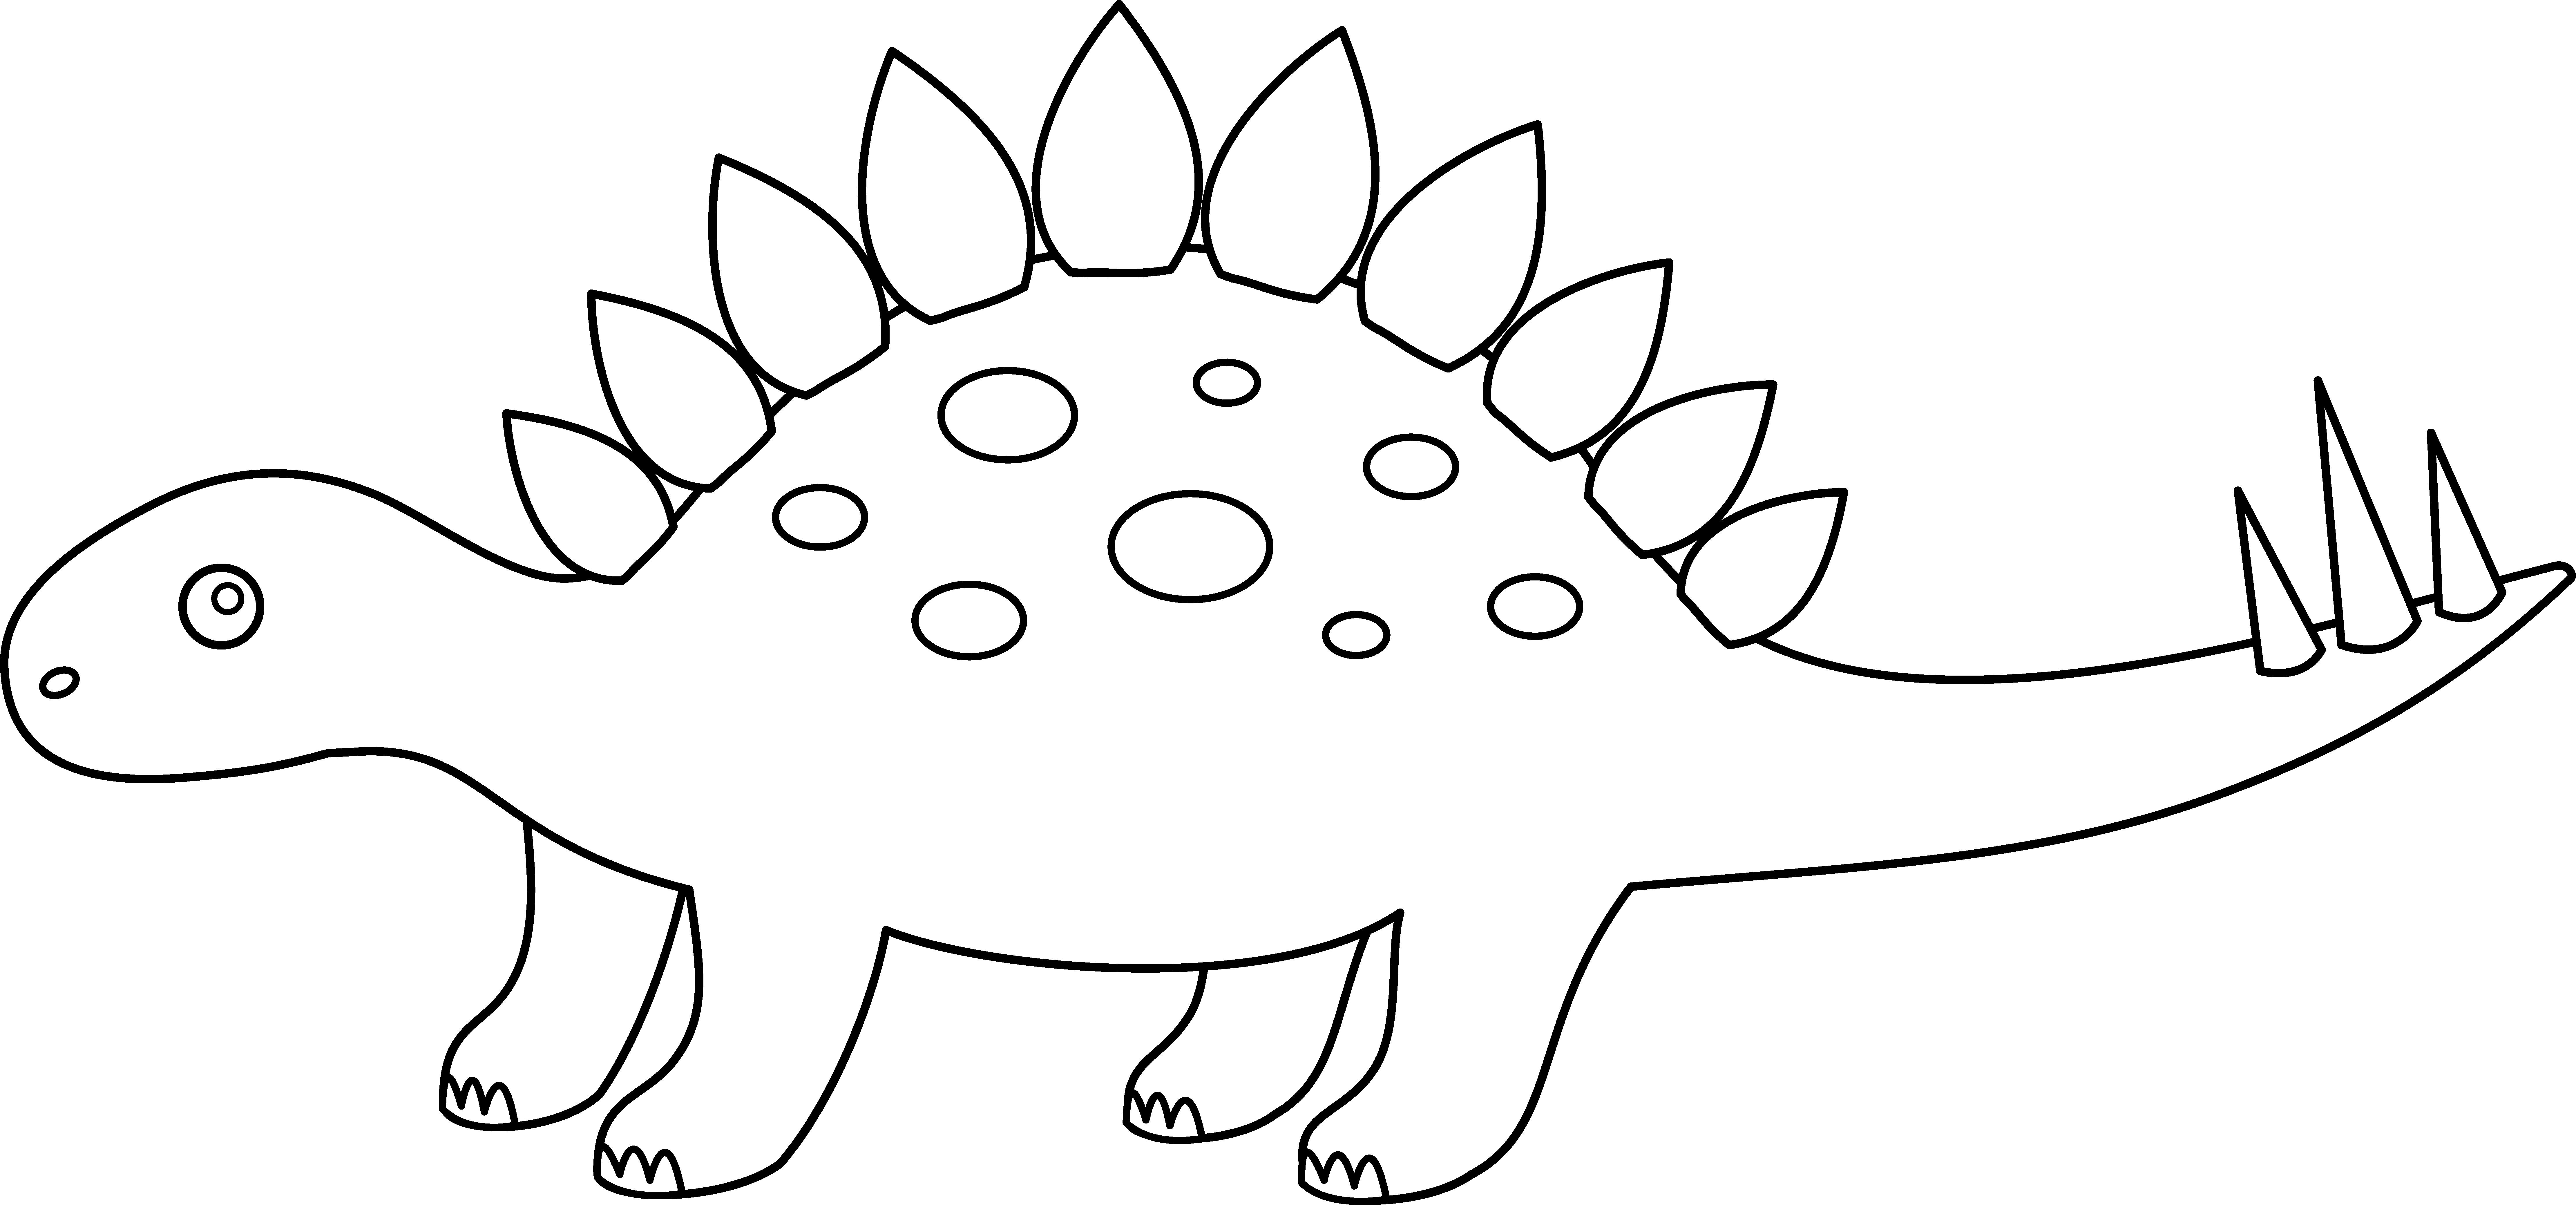 Stegosaurus clipart black and white Felt printable stegosaurus art craft